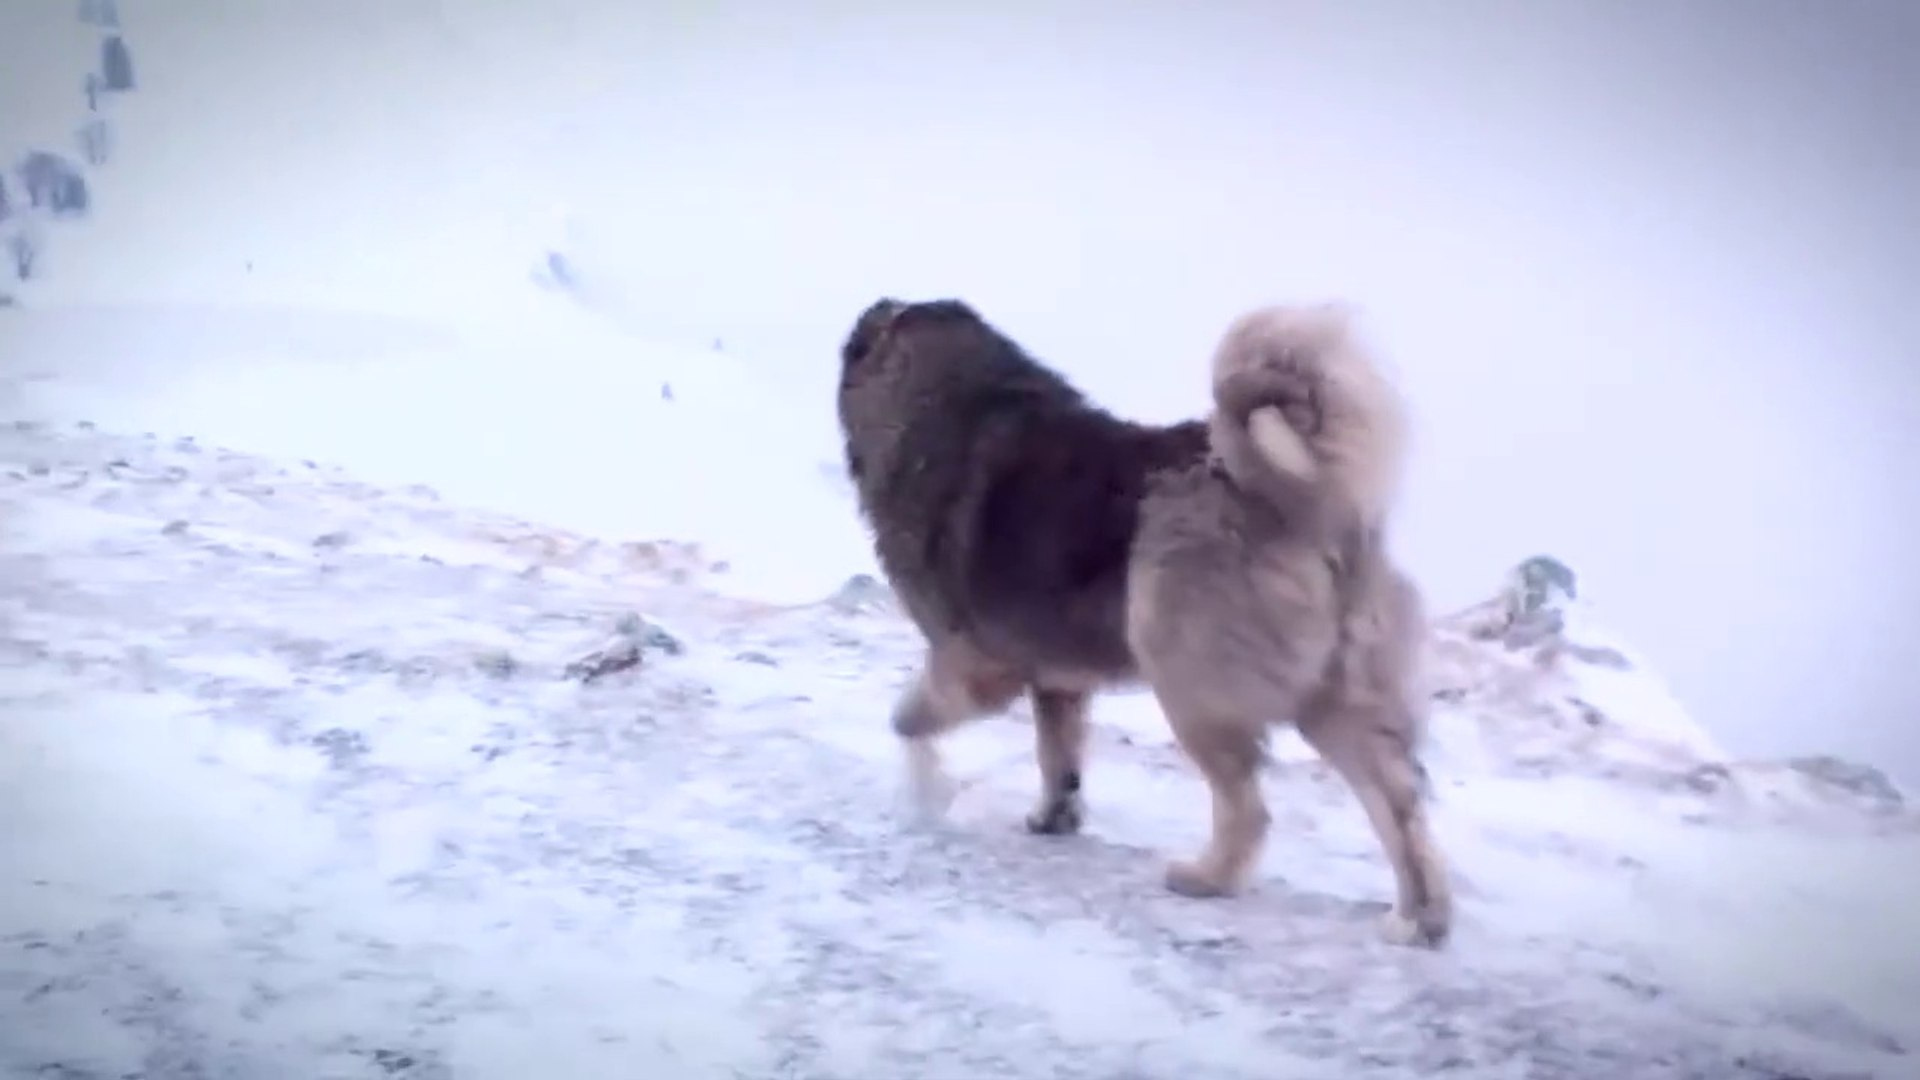 KAFKAS COBAN KOPEGiNiN KAR KEYFi - CAUCASiAN SHEPHERD DOG